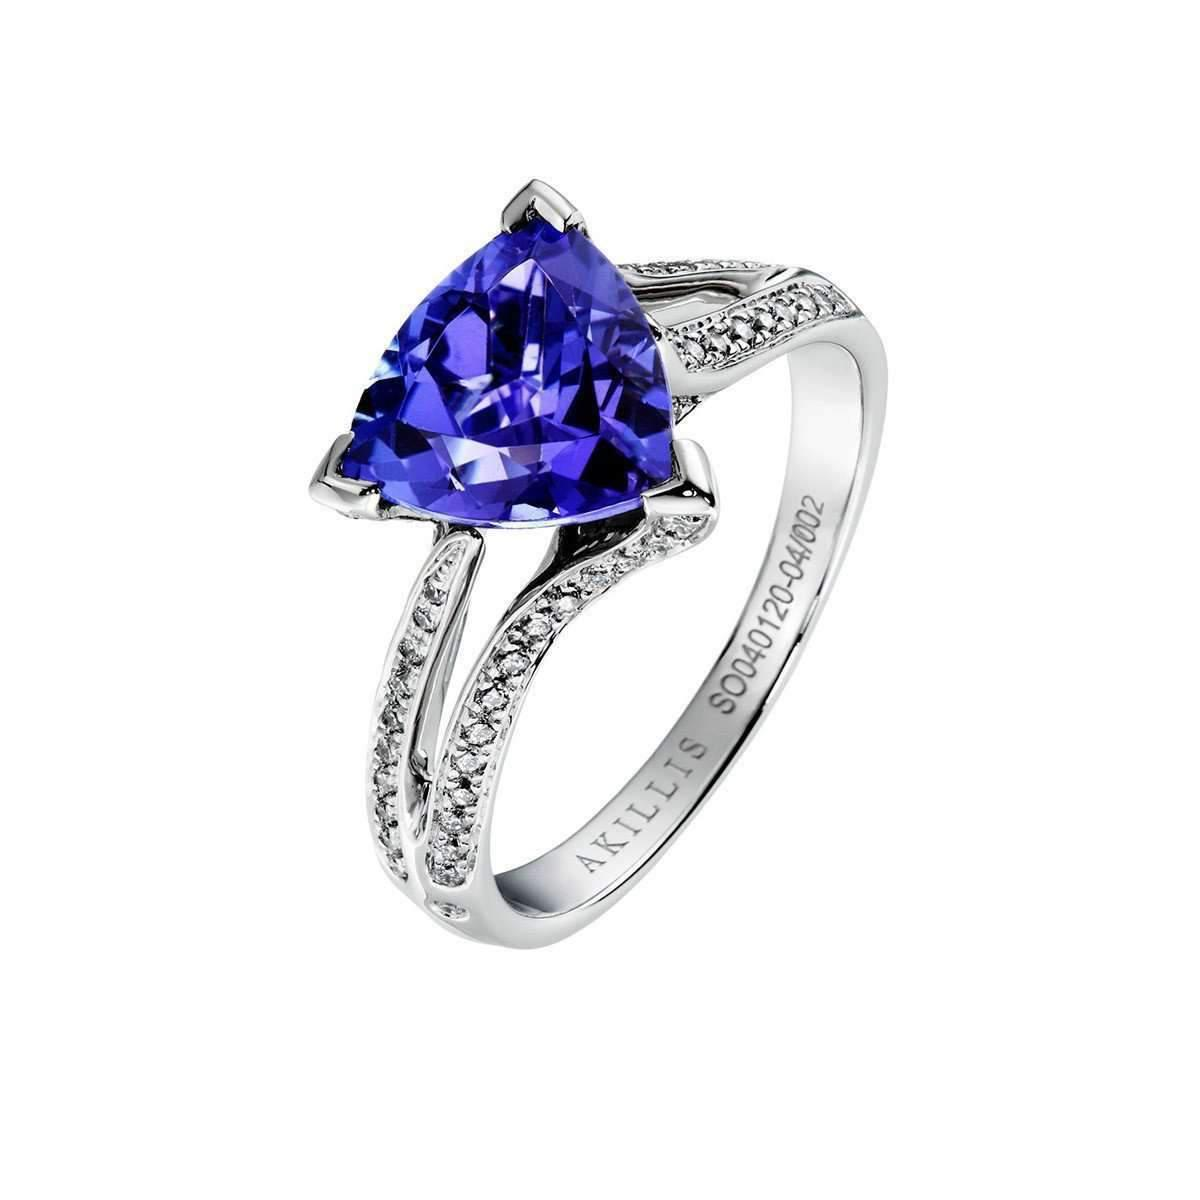 Akillis Python White Gold Diamond Tatou Ring - UK L 1/4 - US 5 3/4 - EU 52 zQCzcTvAM